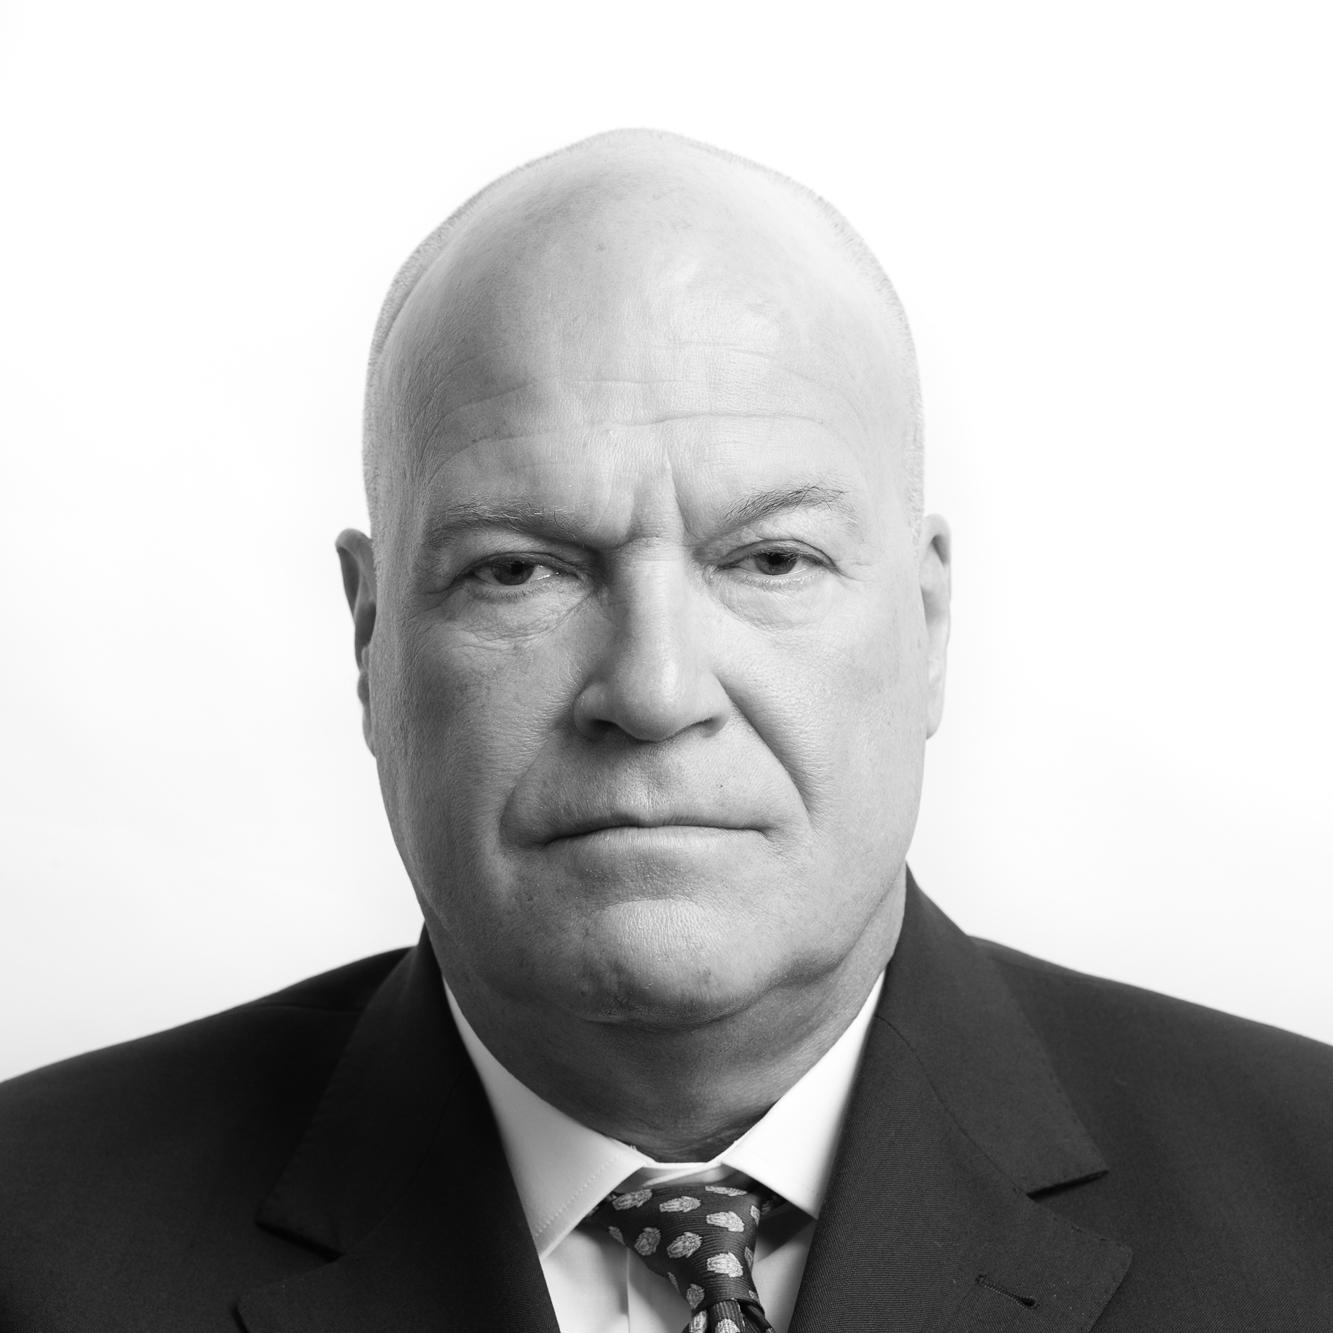 Stéphane Delcroix